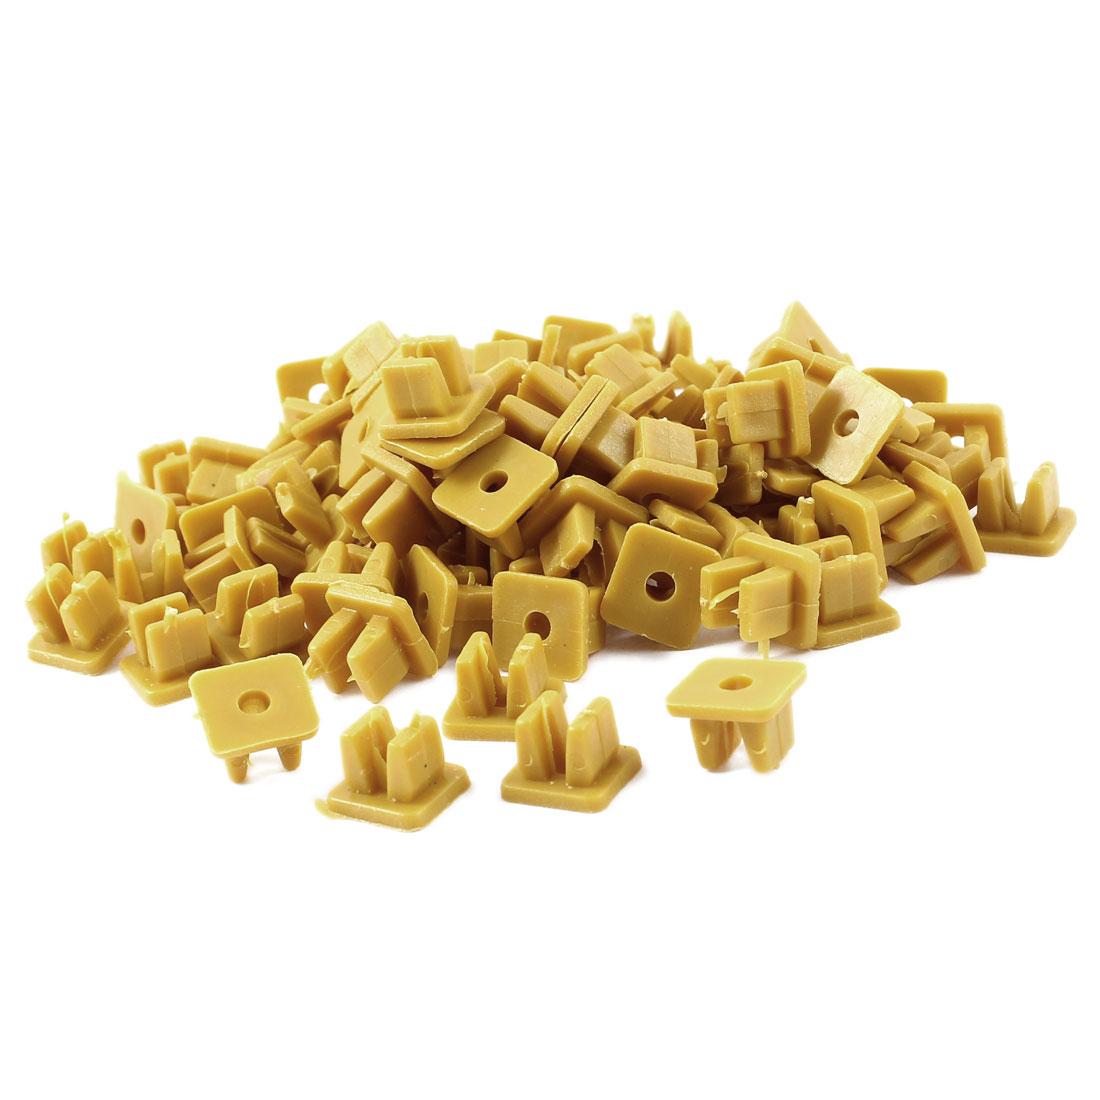 Unique Bargains Yellow 9mm x 8mm Hole Plastic Rivets Fastener 100 Pieces for Auto Car Door